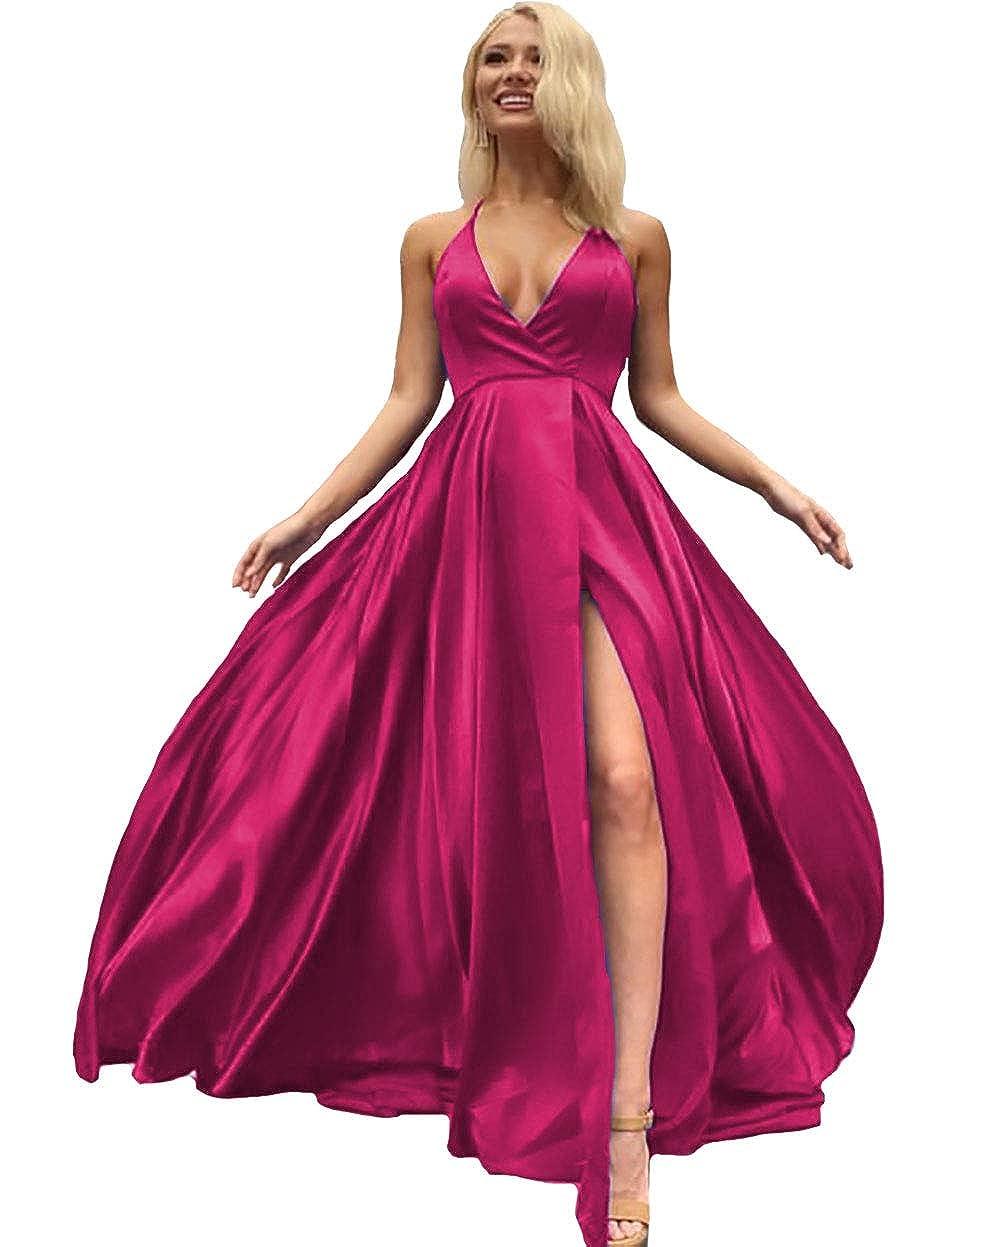 Lavender IVYPRECIOUS V Neck Side Split Prom Dresses A Line Long Evening Gowns for Women